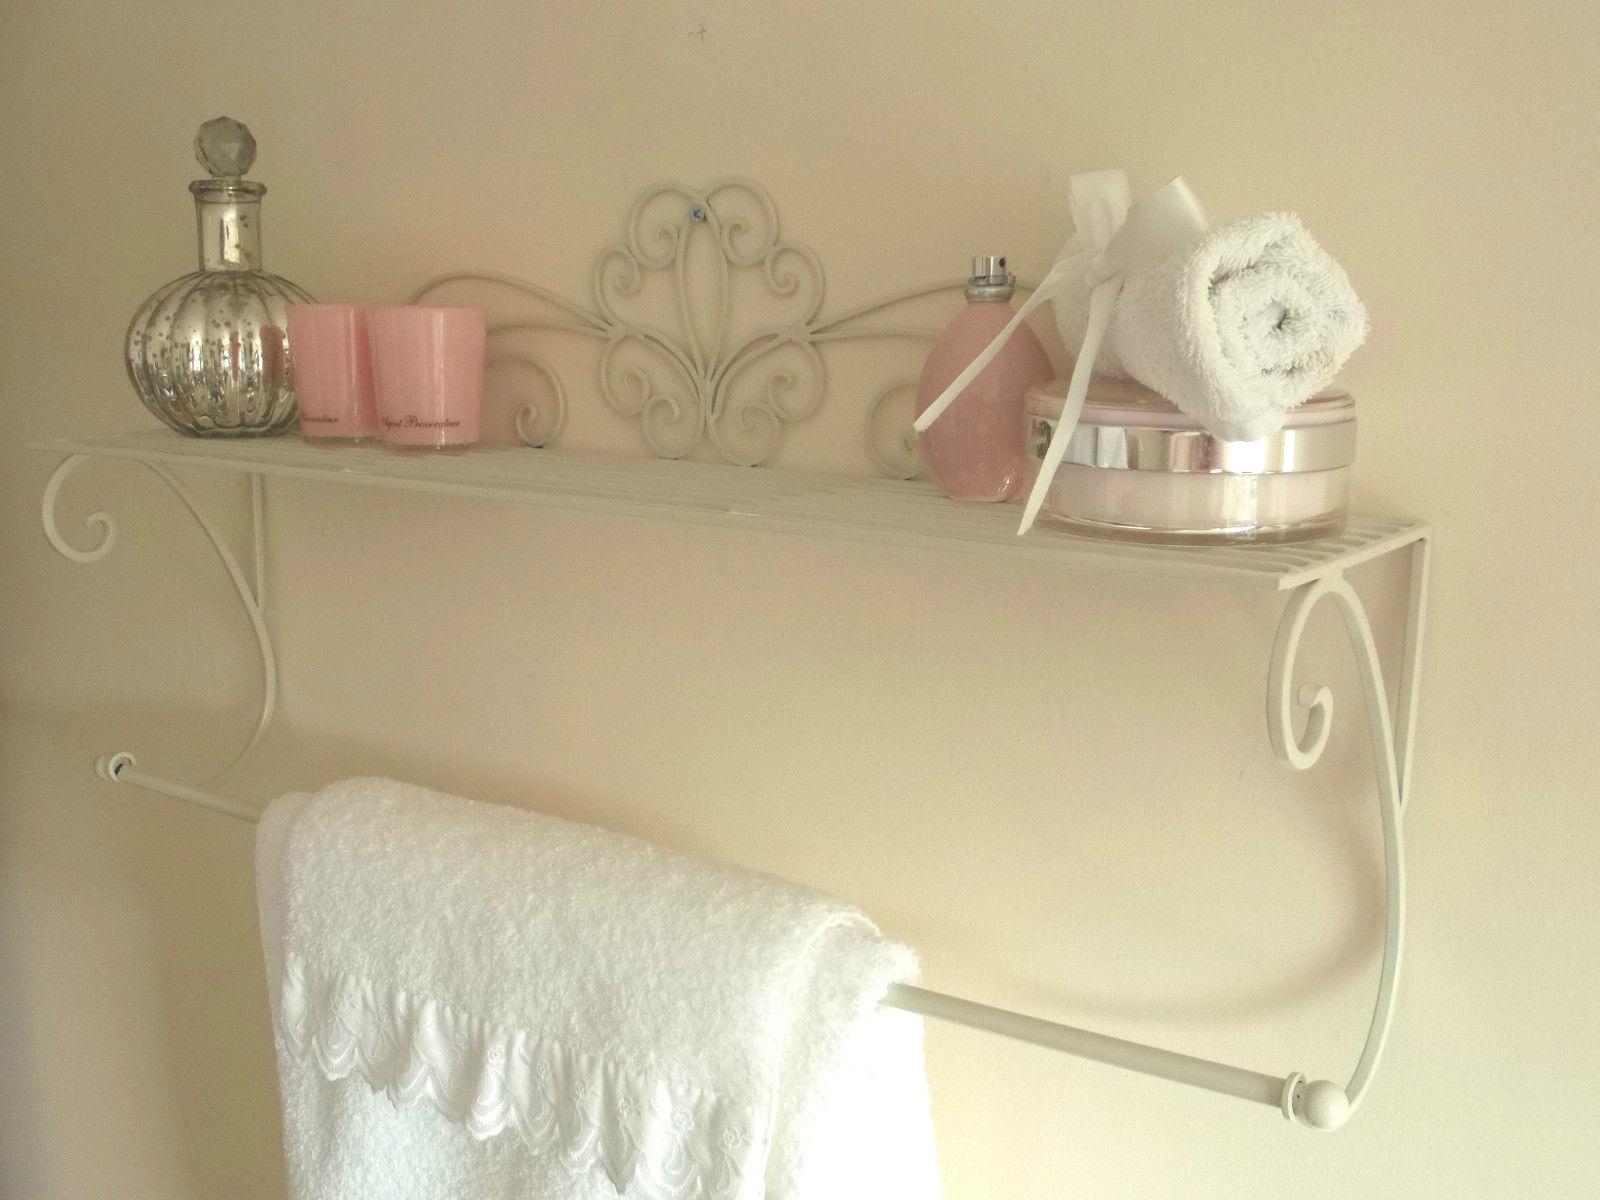 cream wall mounted towel rail shelf amazing grace. Black Bedroom Furniture Sets. Home Design Ideas